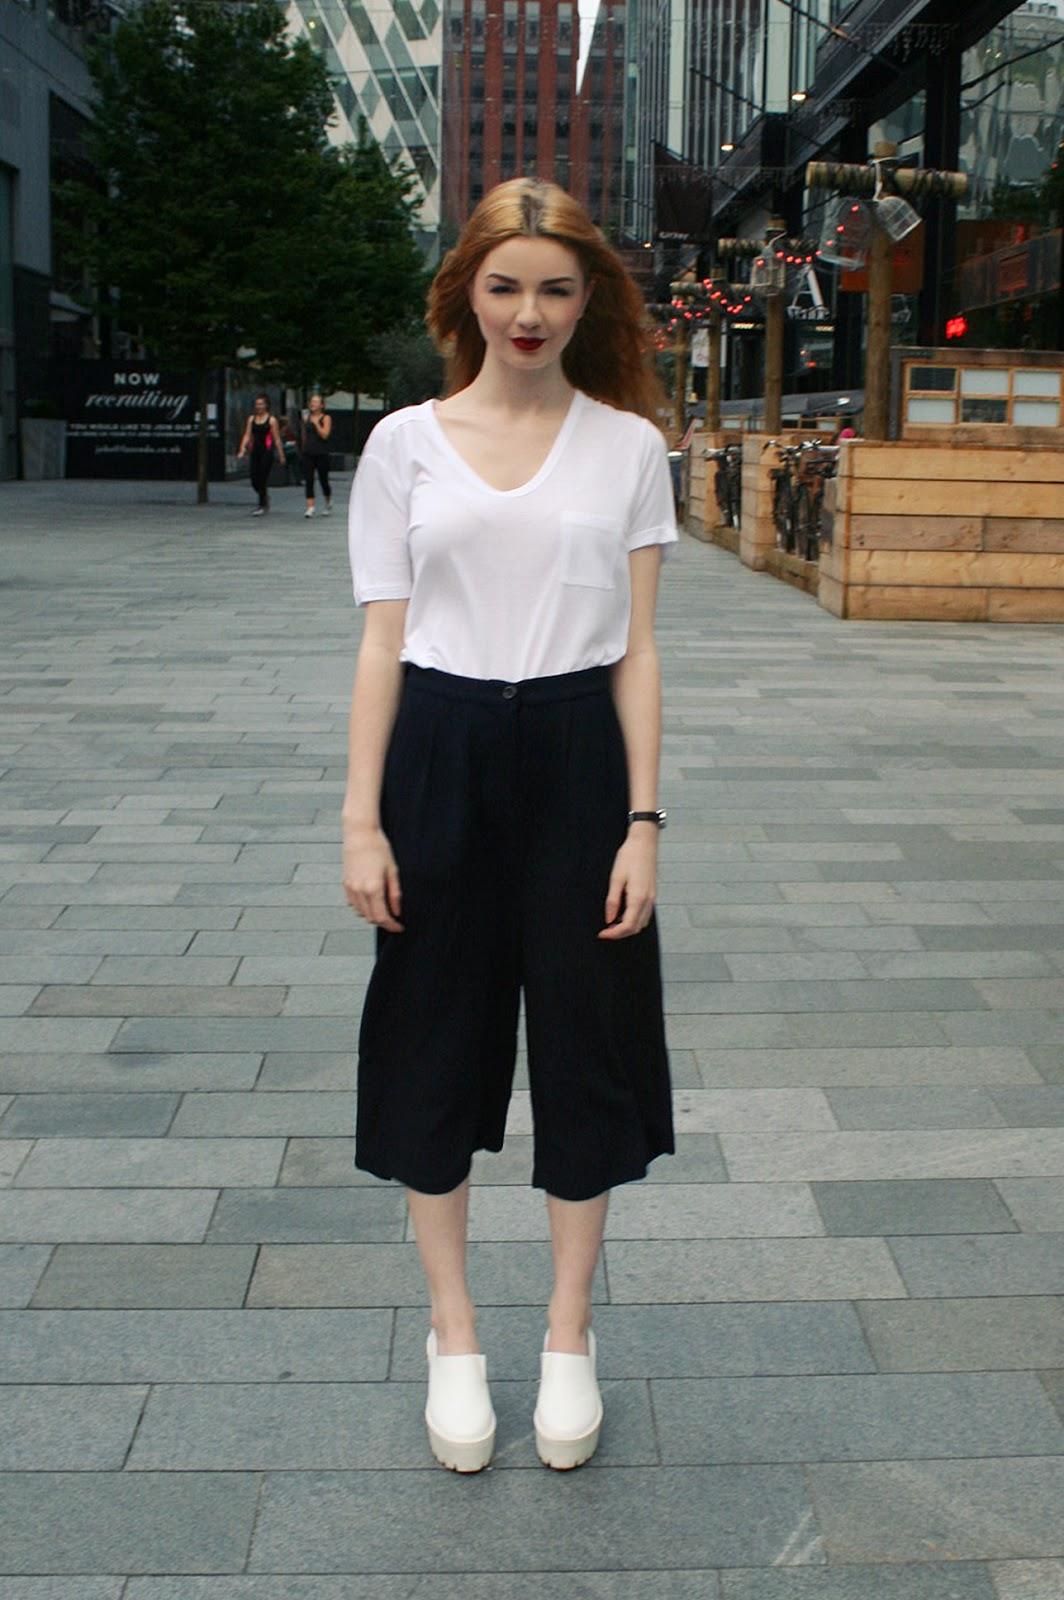 Black t shirt outfit tumblr - Facebook Bloglovin Instagram Twitter Lookbook Tumblr